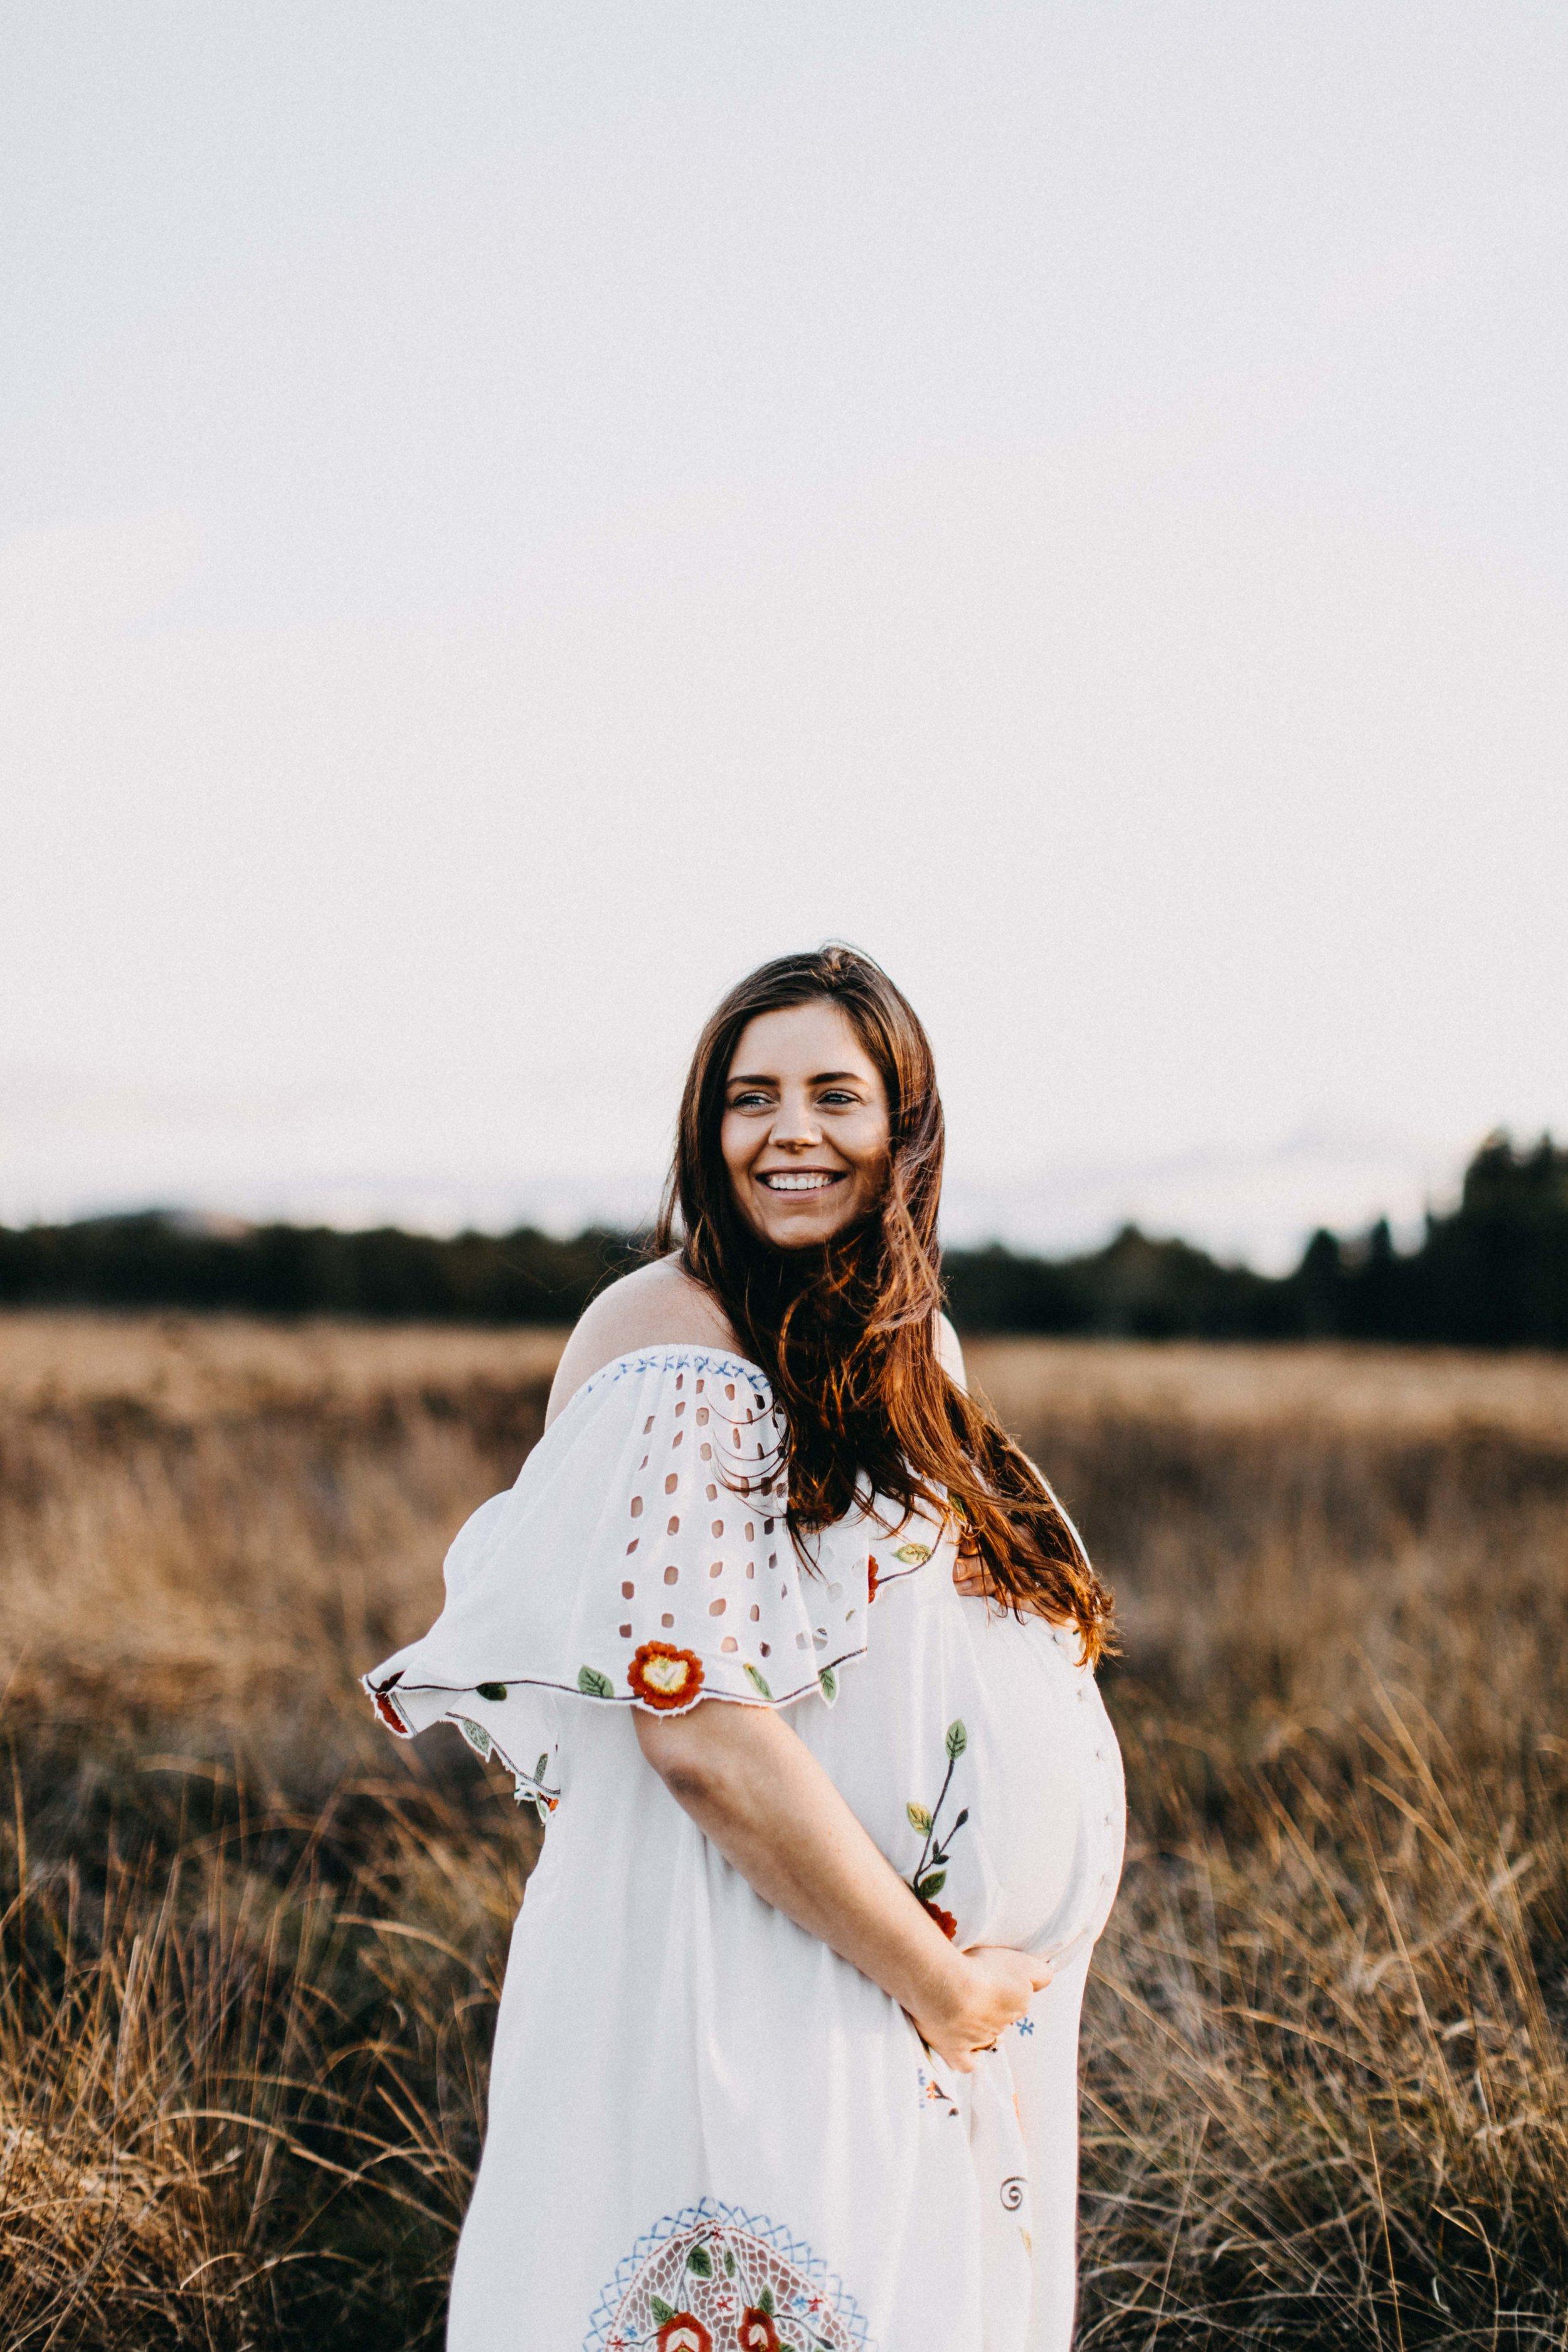 camden-maternity-session-emilyobrienphotography.net-39.jpg